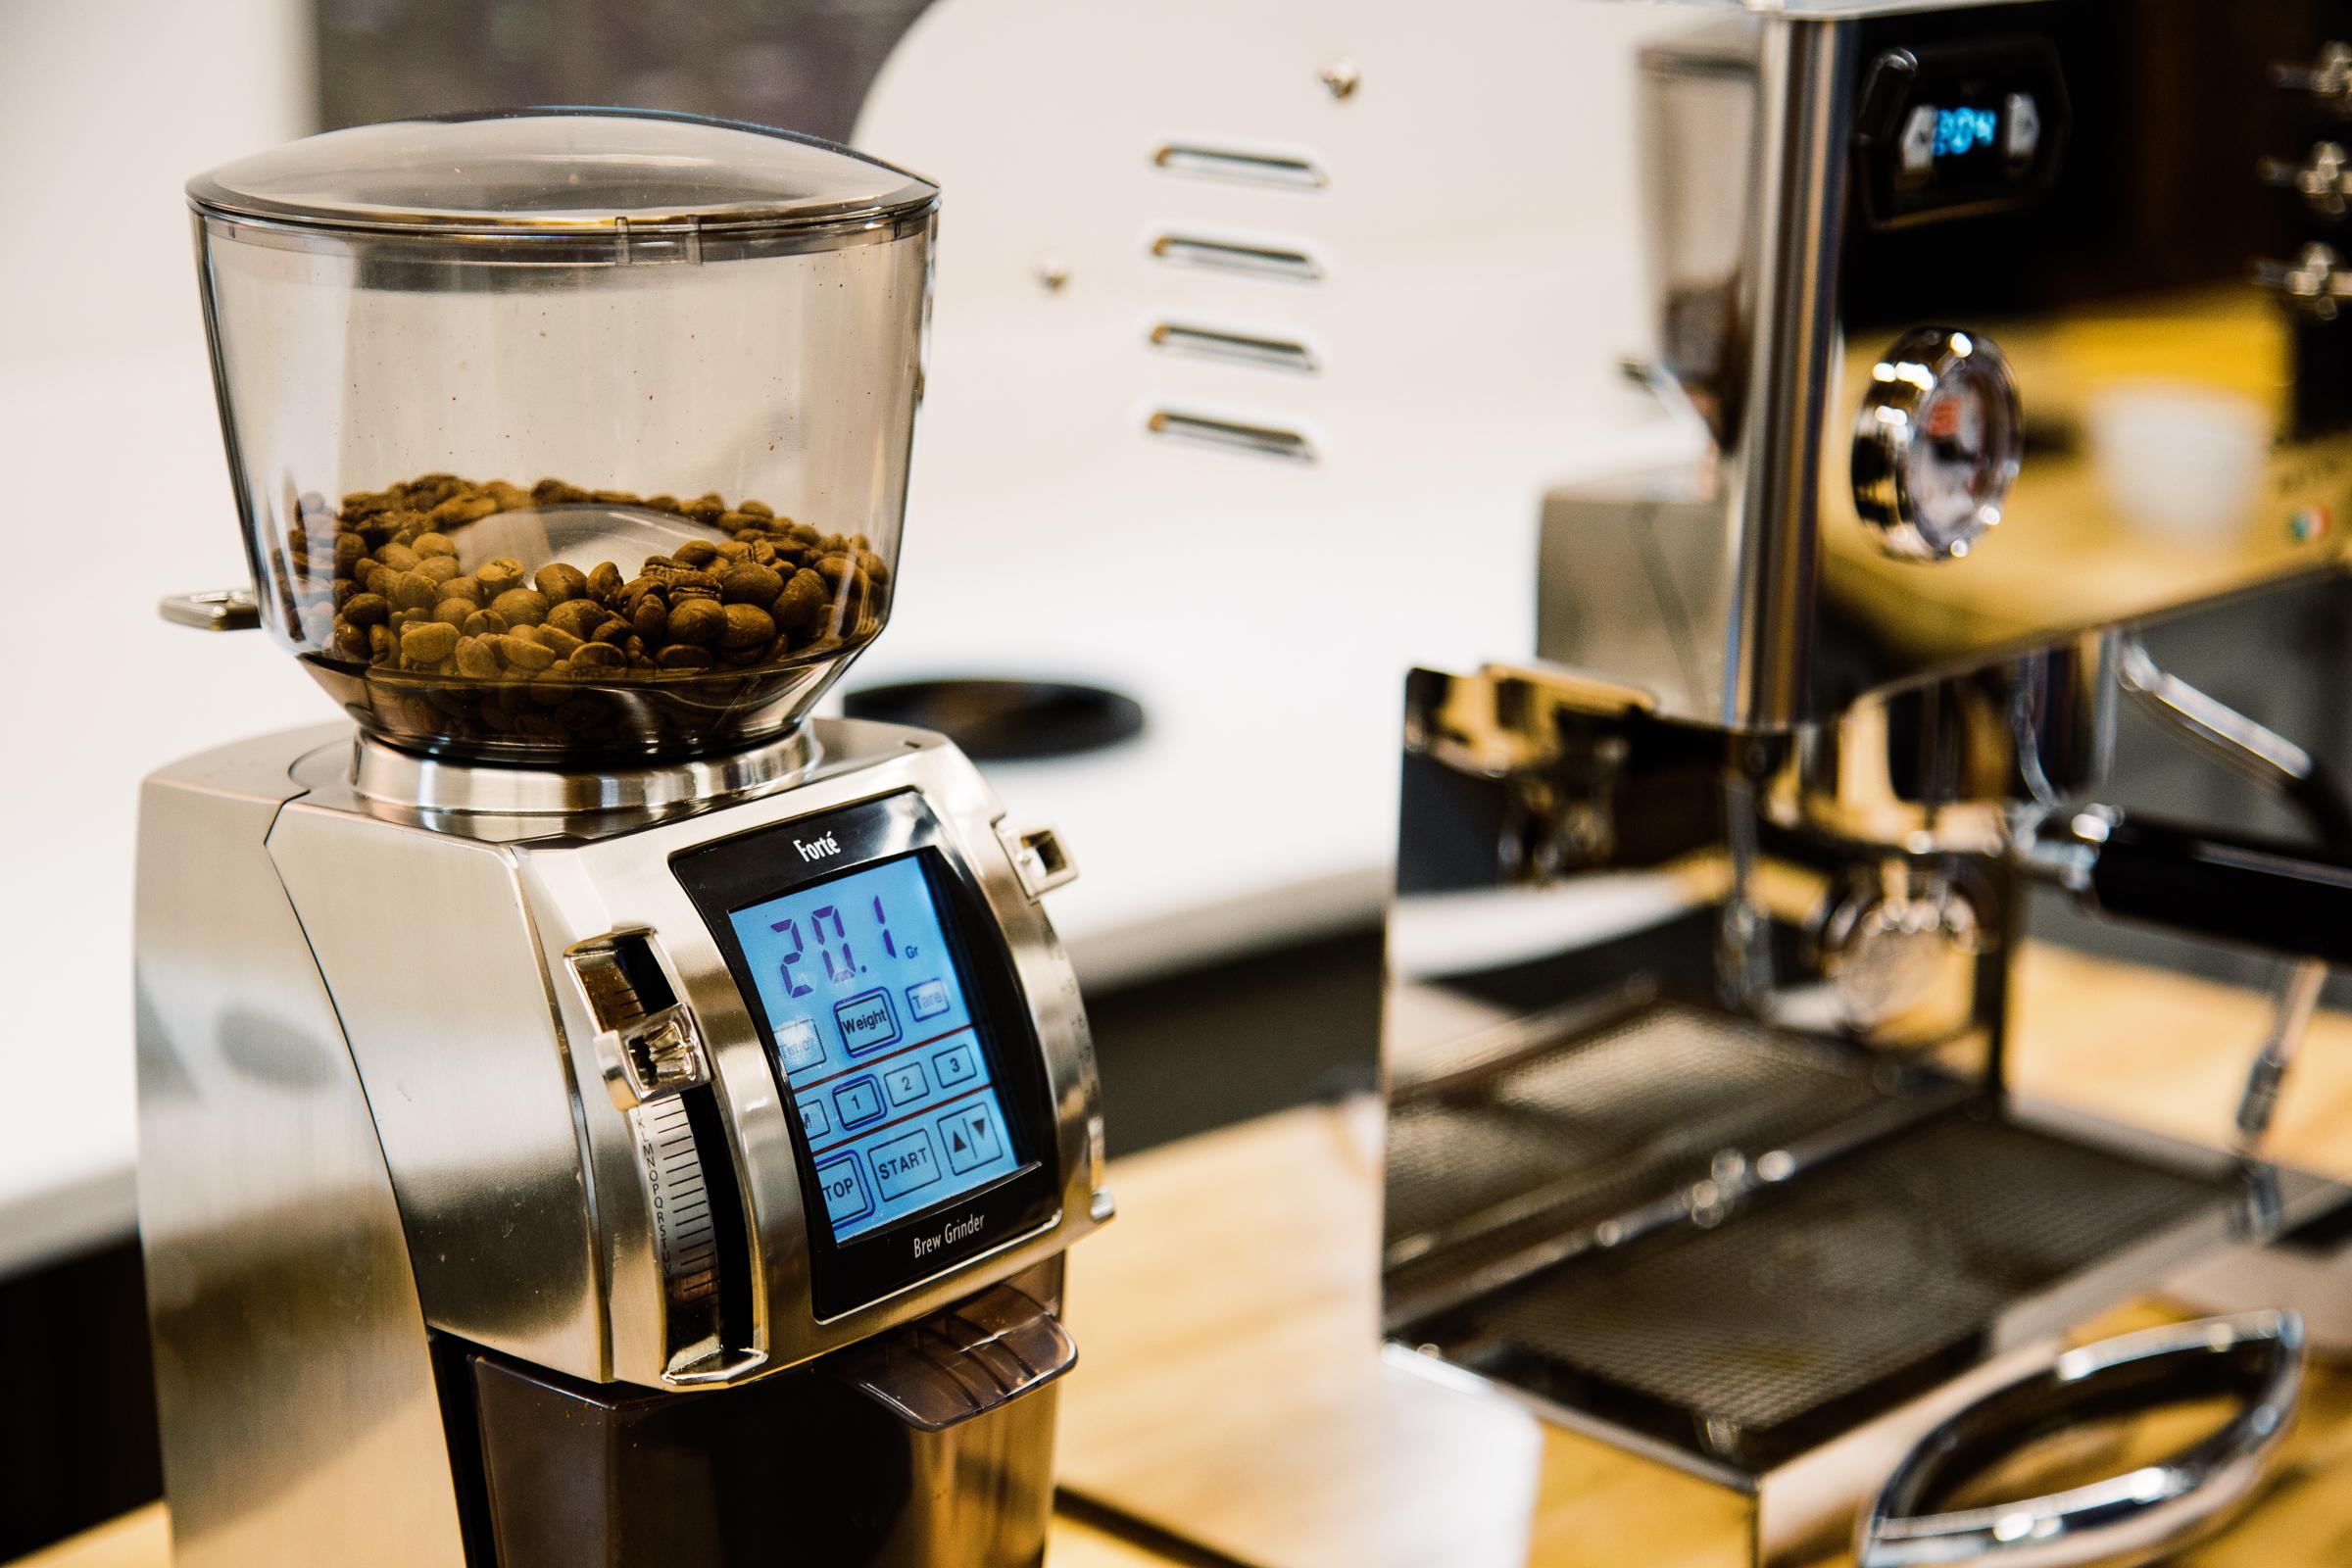 Baratza Forte with home espresso machine